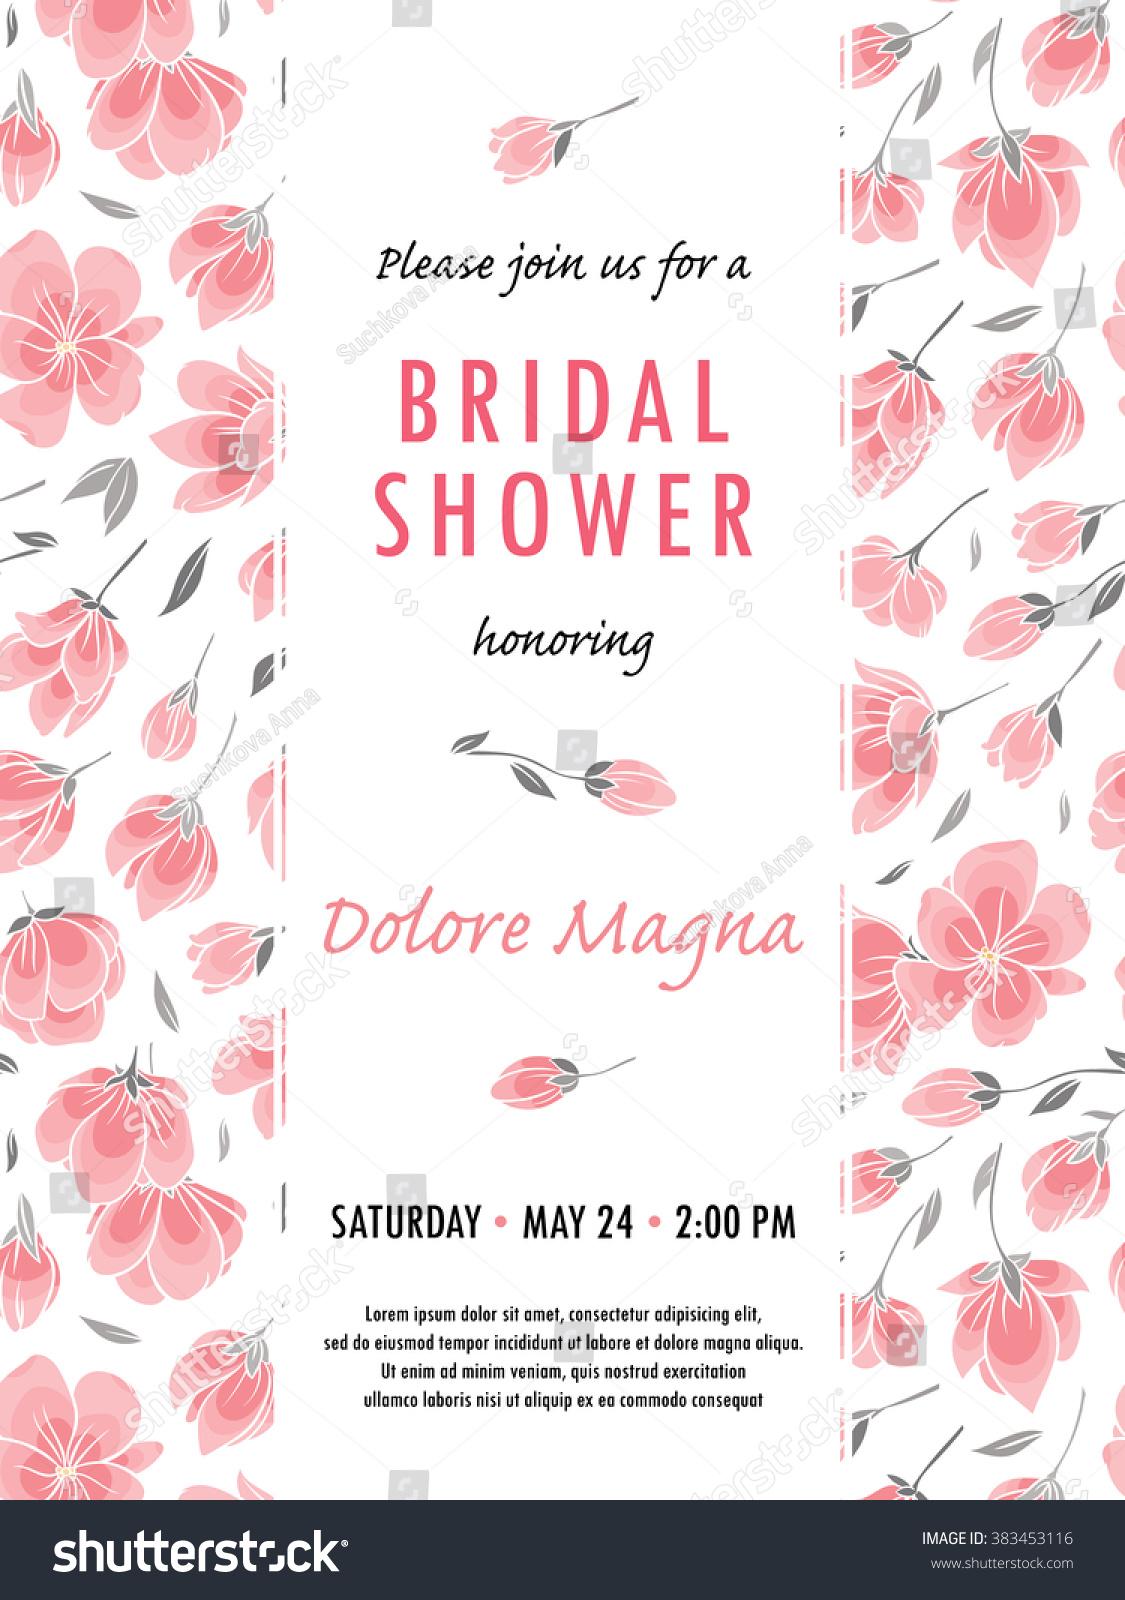 bridal shower advice cards template - invitation bridal shower card cherry sakura stock vector